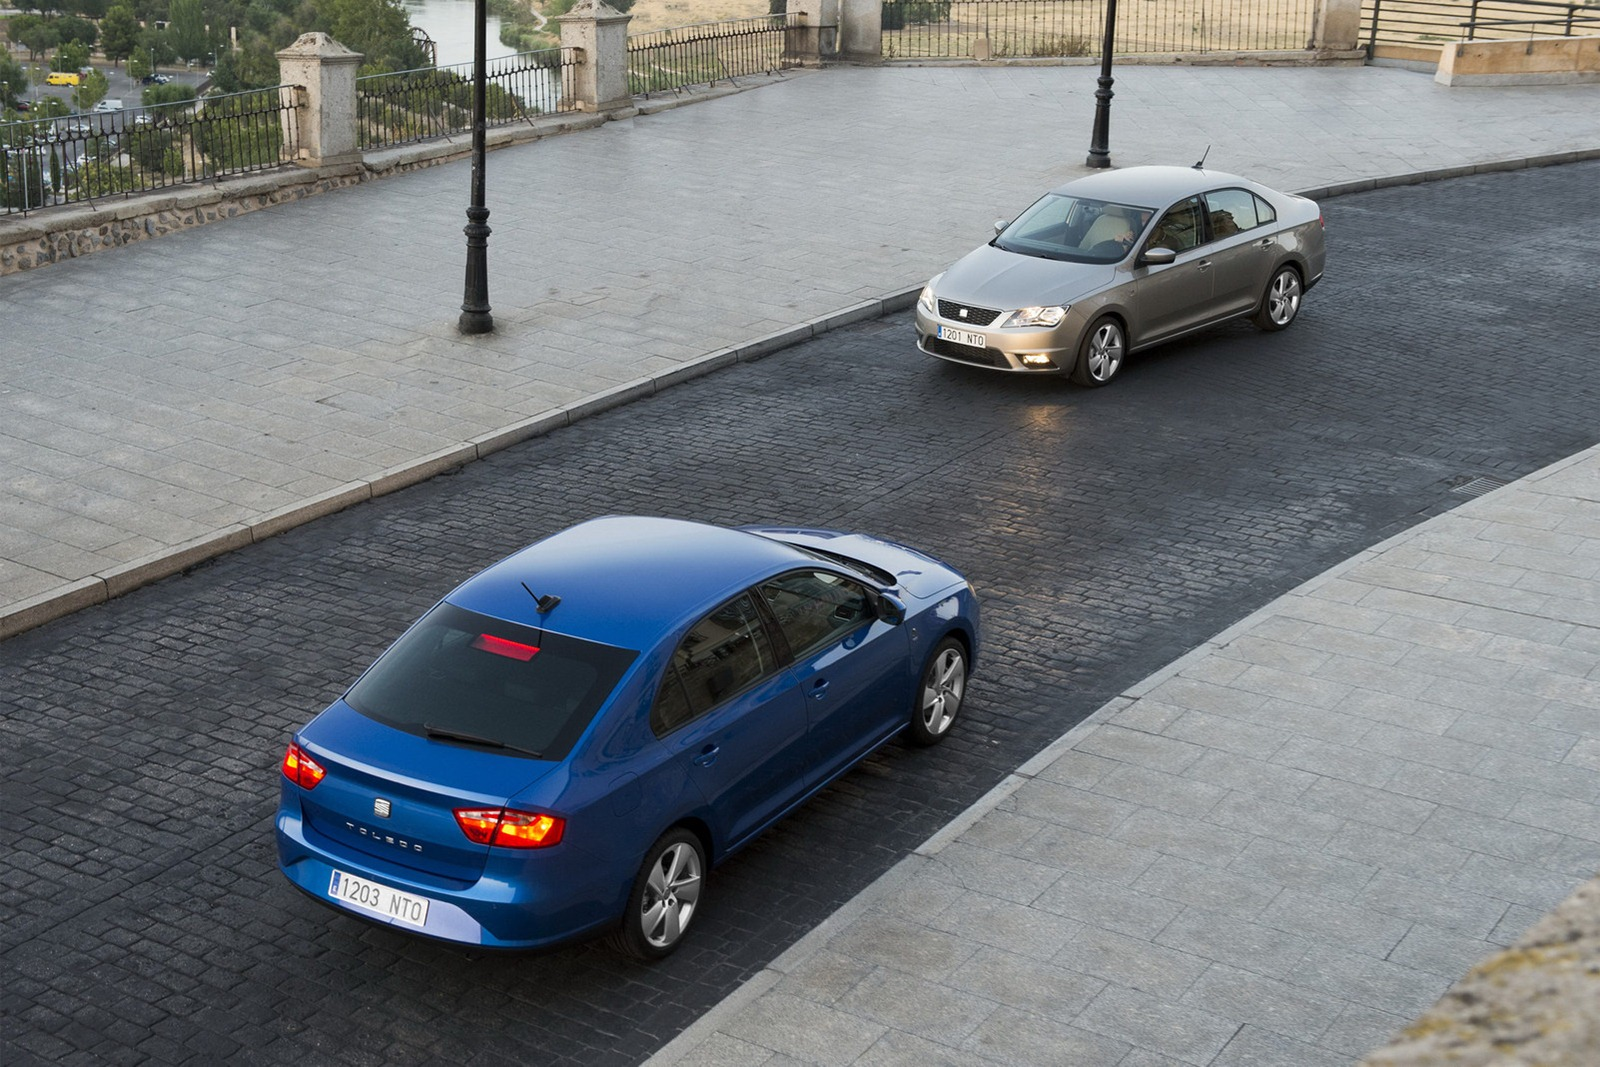 2012 - [Seat] Toledo IV - Page 6 2013-Seat-Toledo-Sedan-5%25255B2%25255D